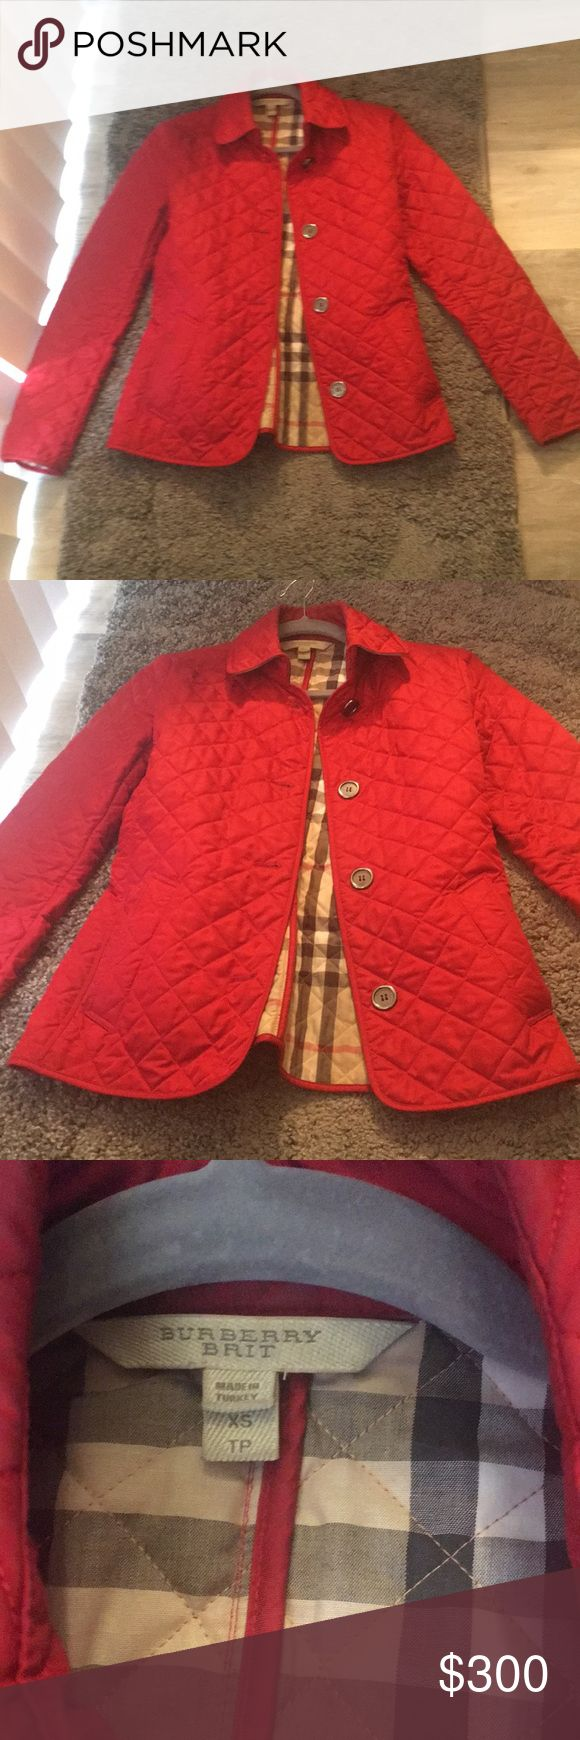 Burberry Brit Jacket Excellent Condition. No damage. Burberry Jackets & Coats